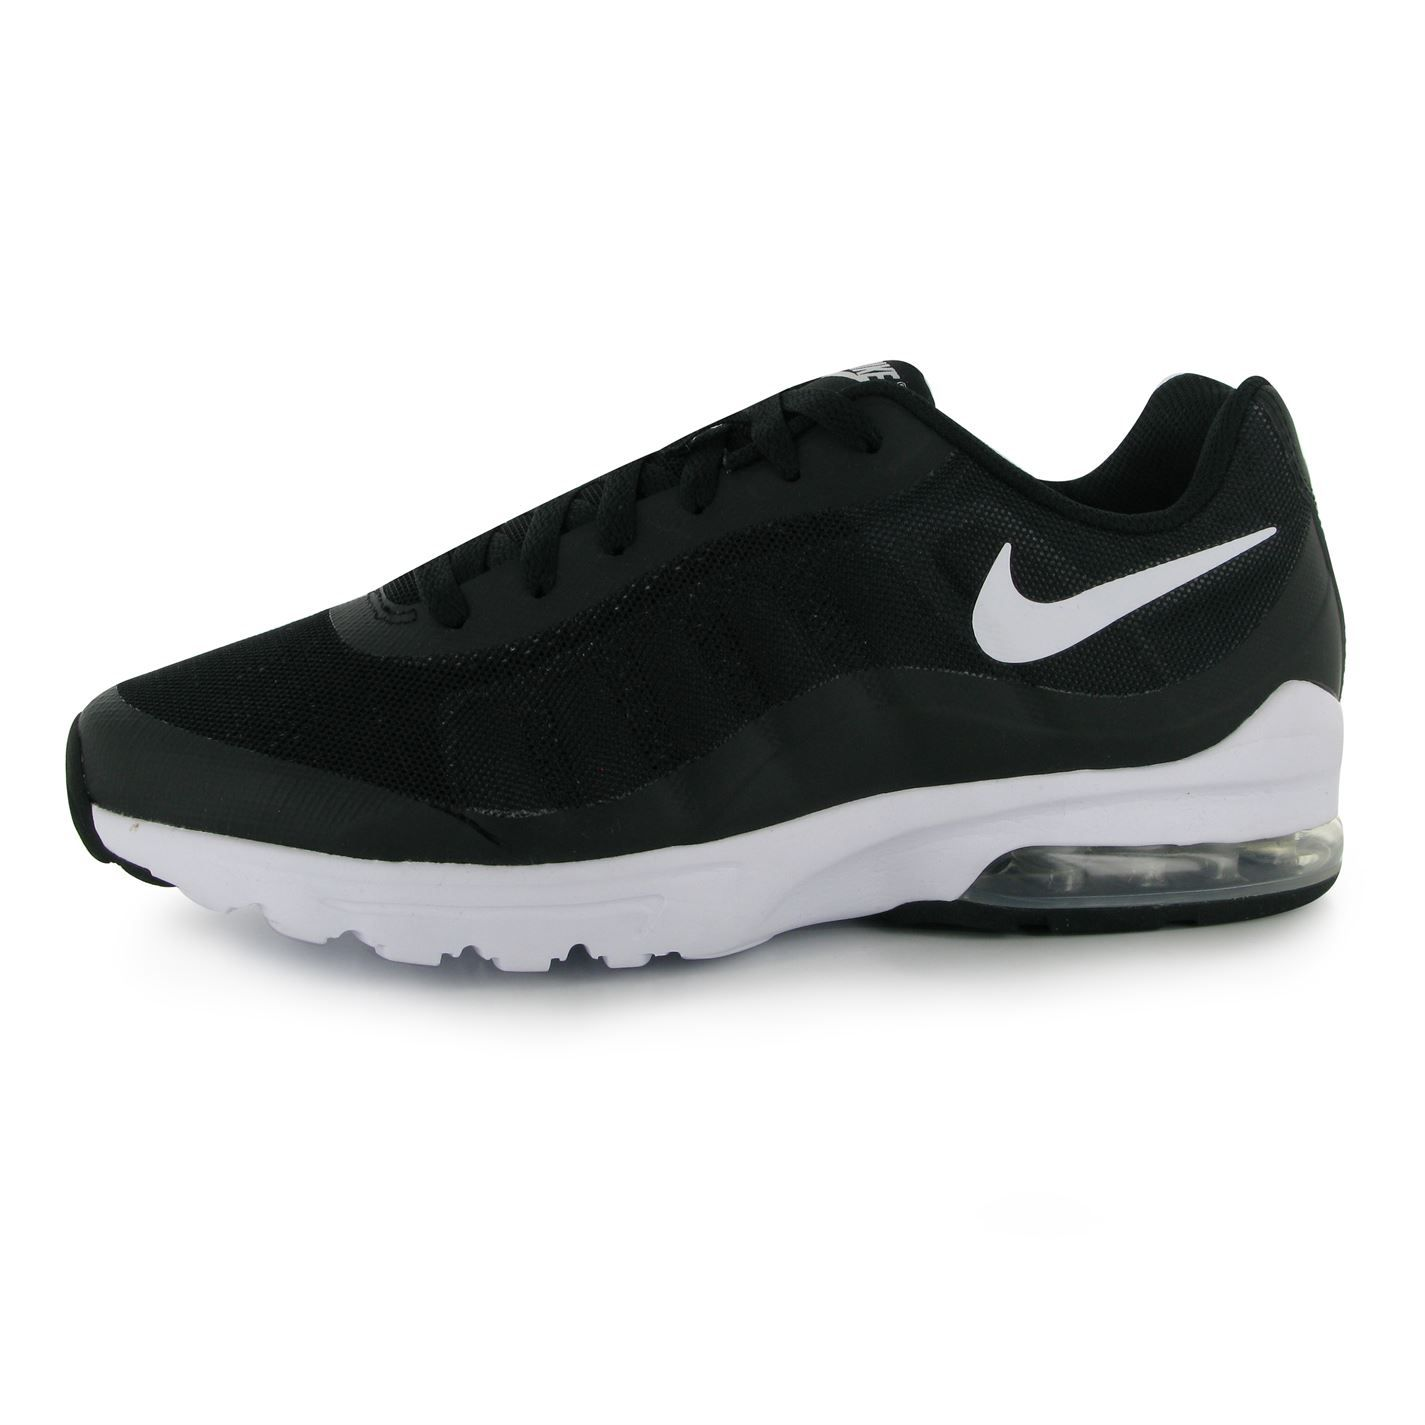 Nike Air Max Invigor Mens | Style Inspiration | Nike air max, Air ...